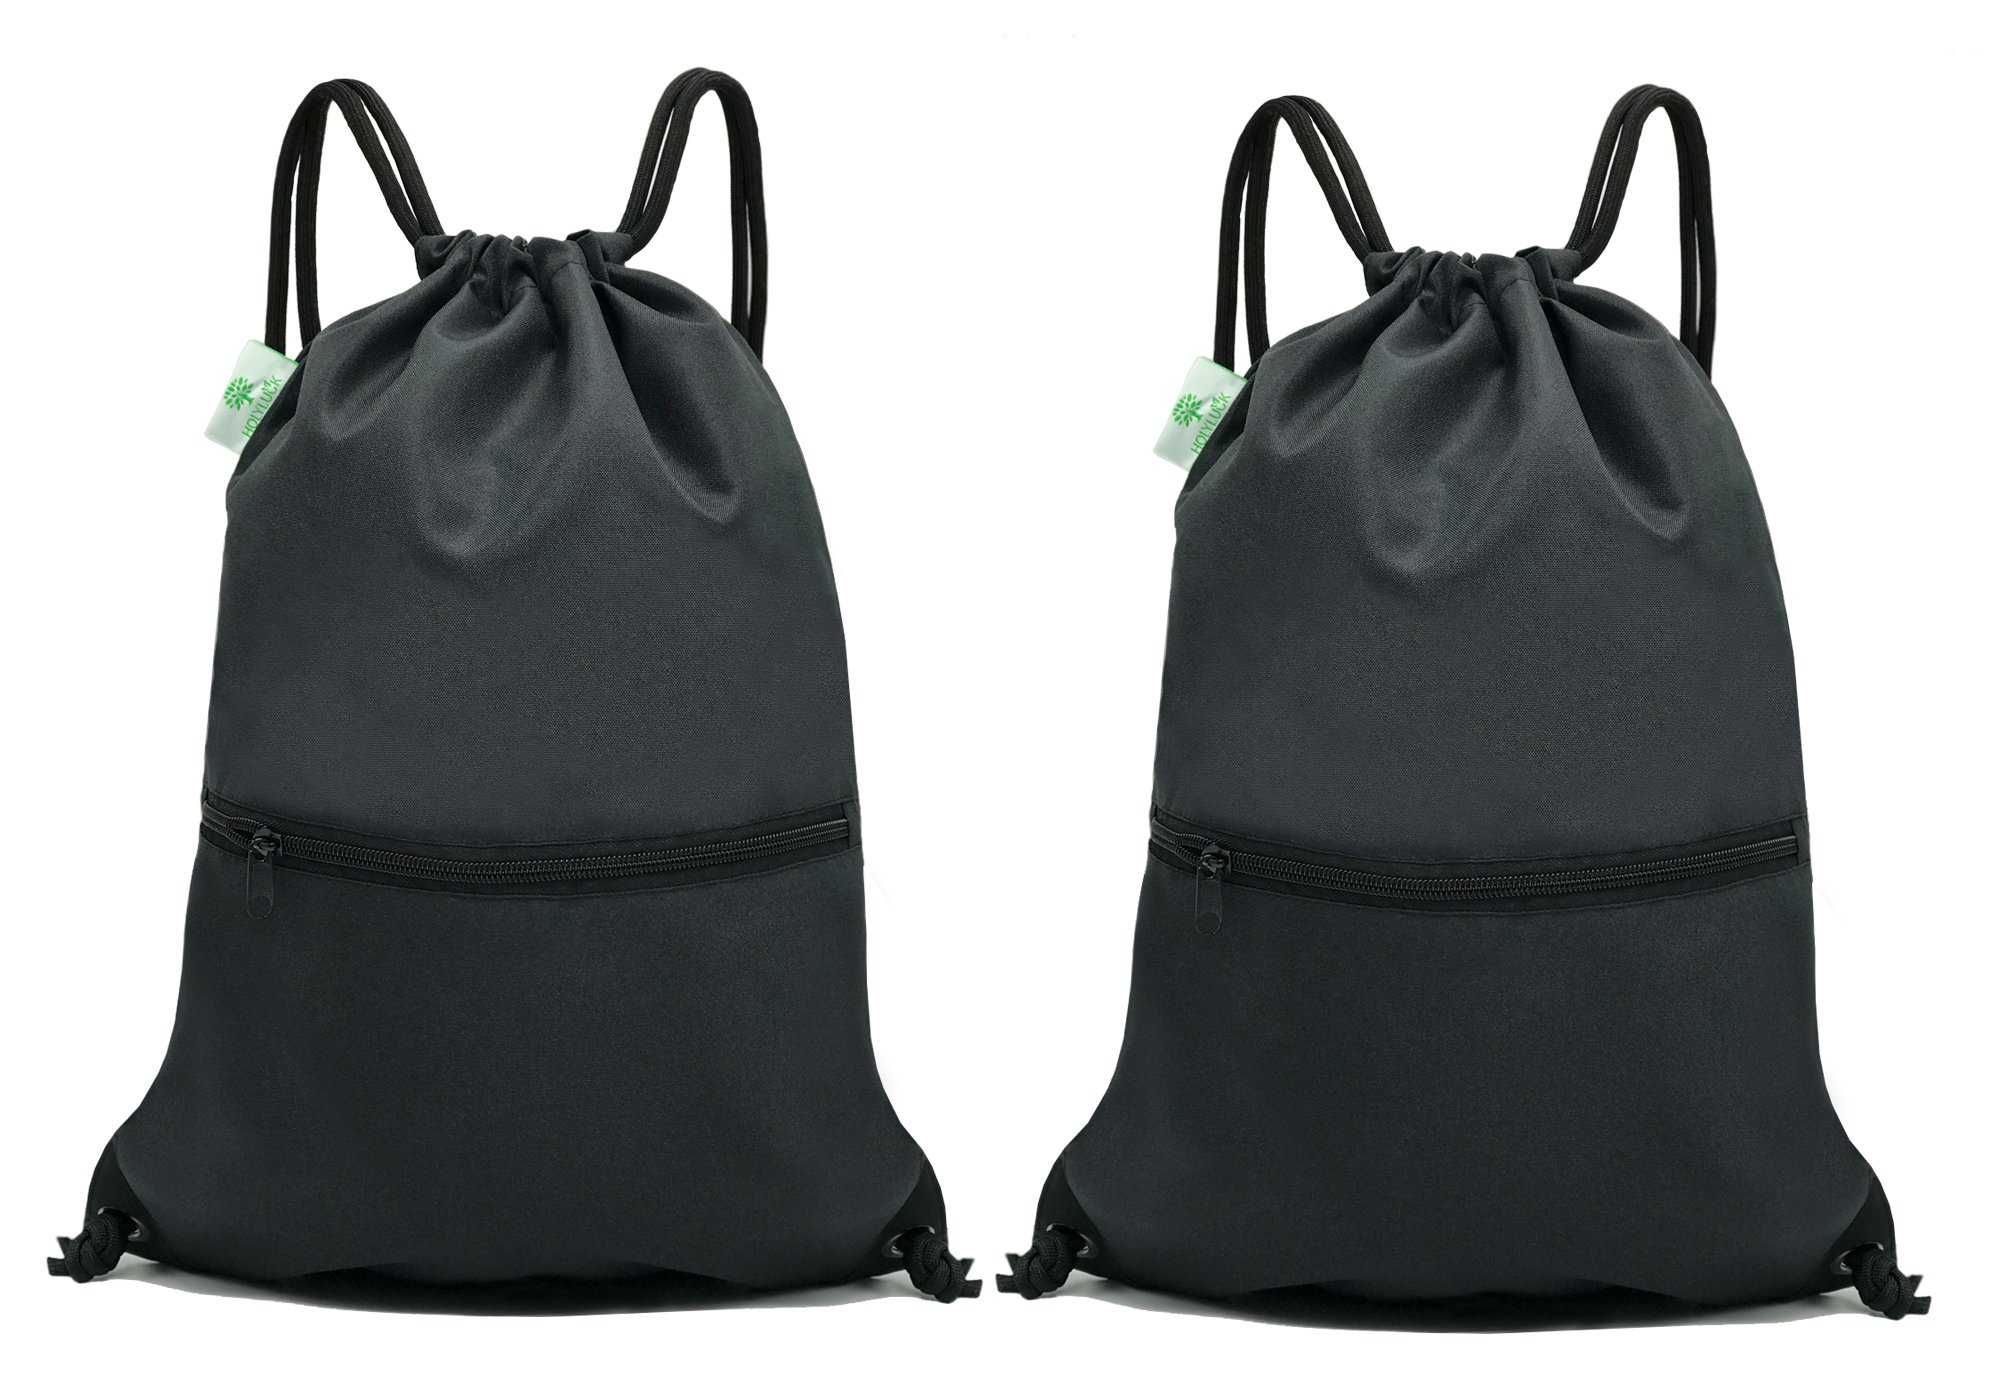 HOLYLUCK Men & Women Sport Gym Sack Drawstring Backpack Bag- 2black